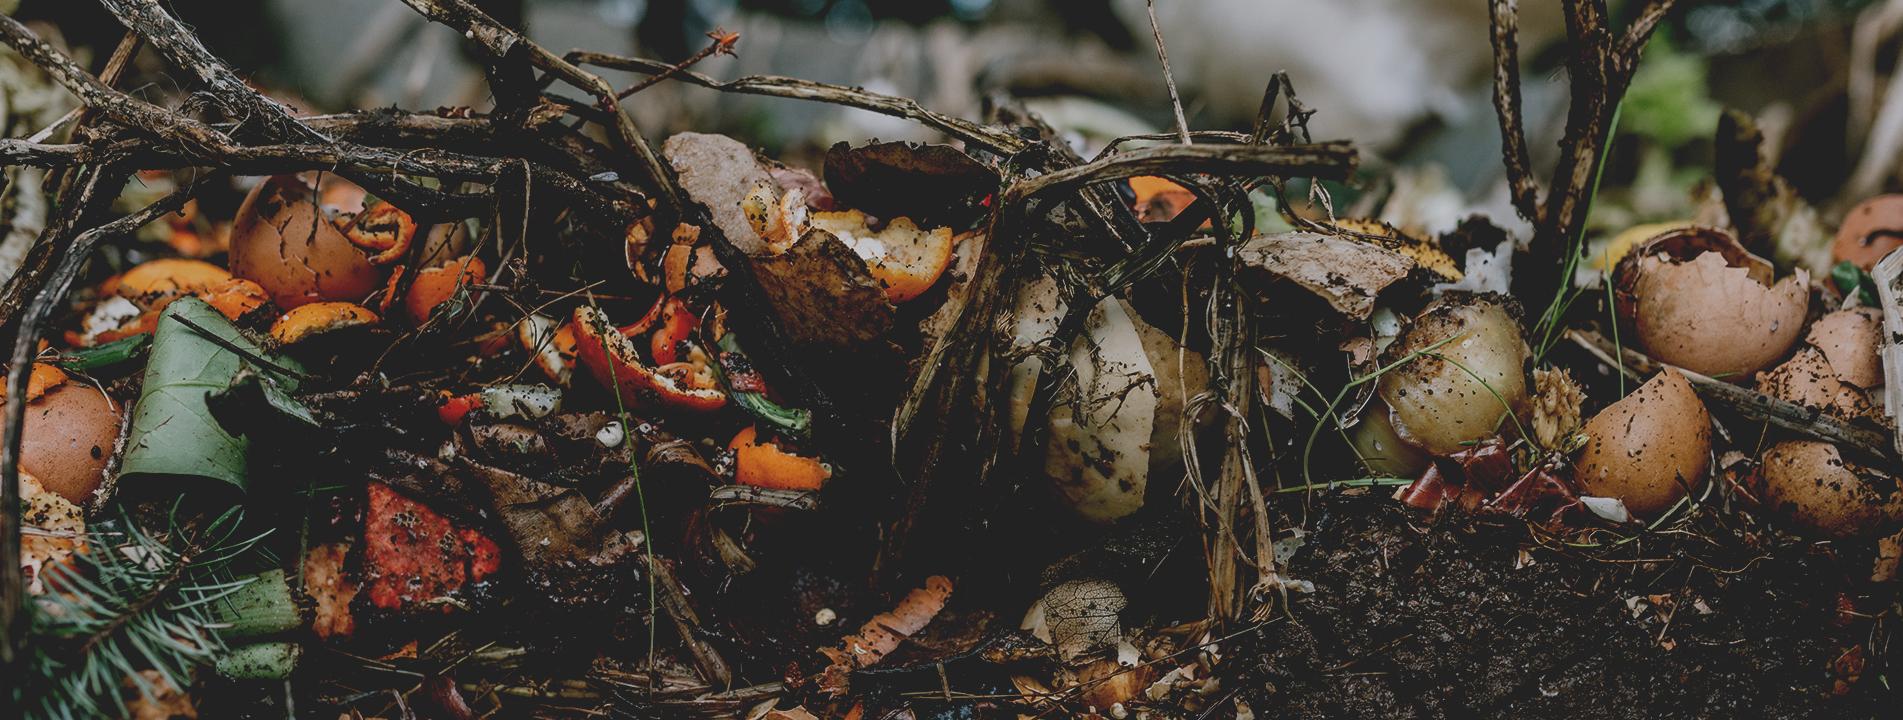 Baugeois Compost - Le compostage